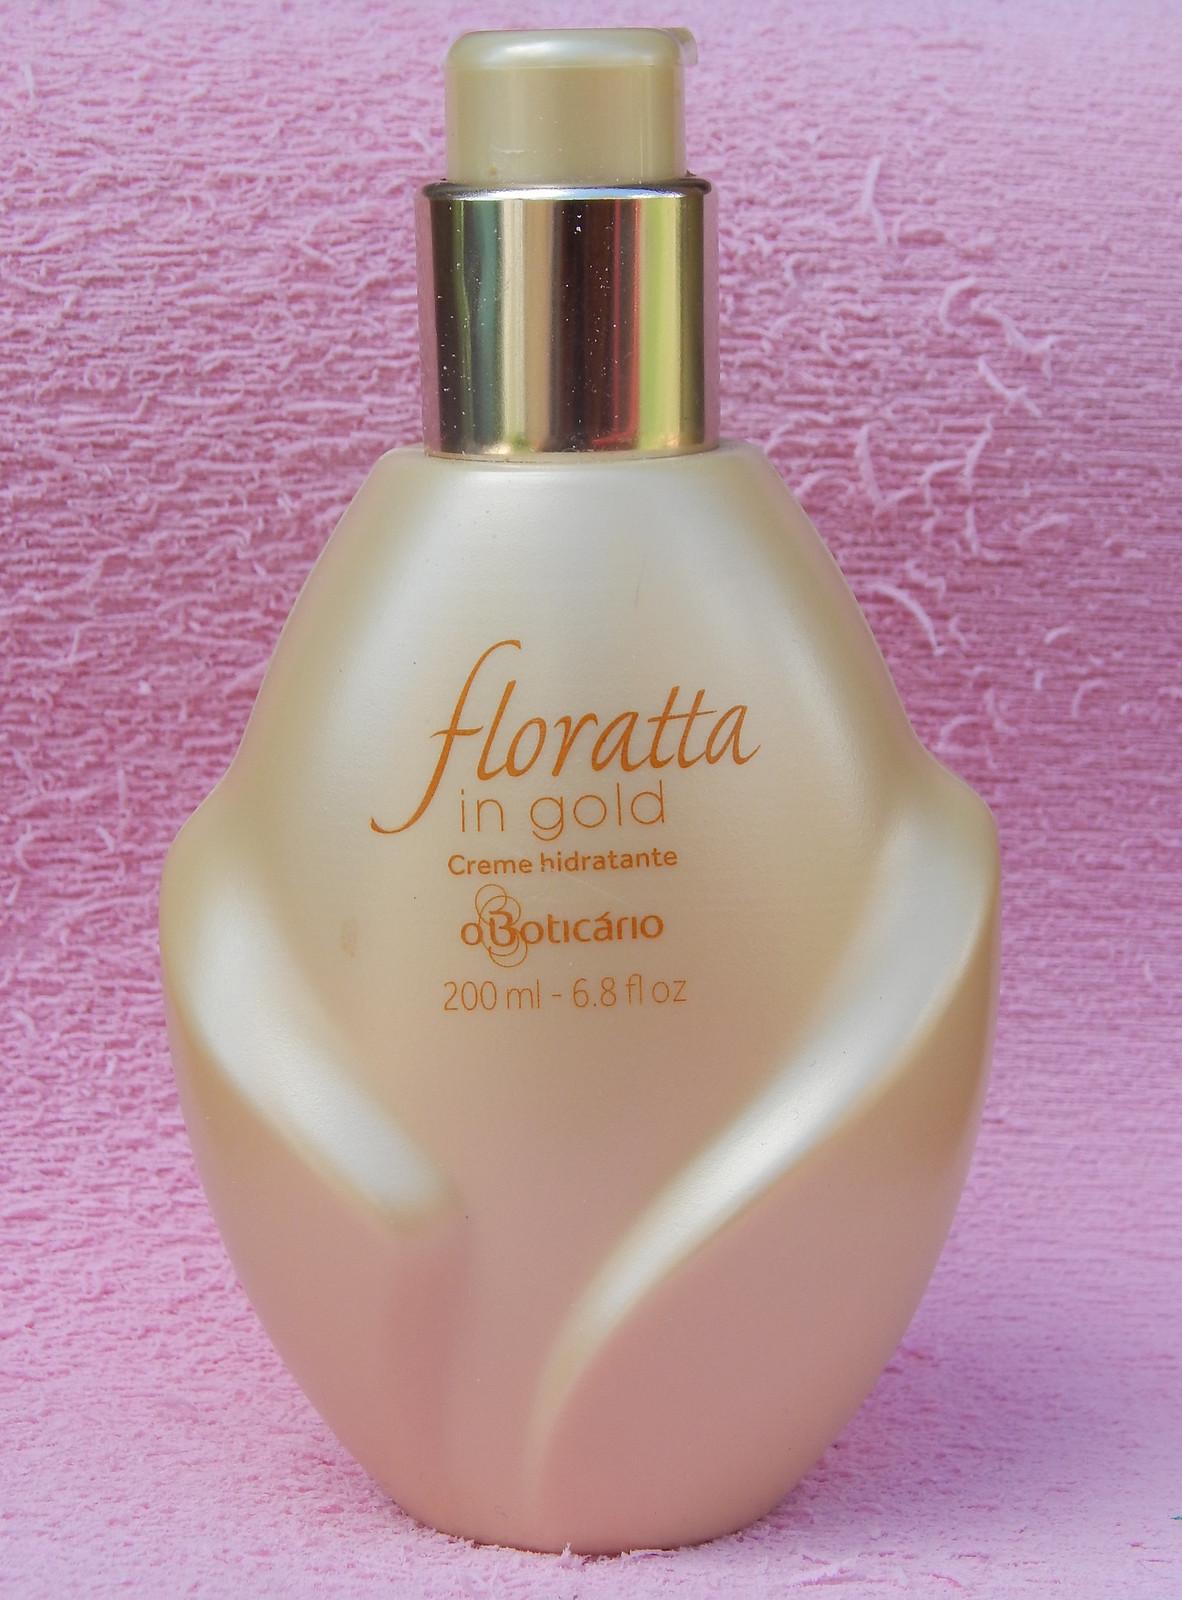 Creme  hidratante Floratta in Gold O Boticário